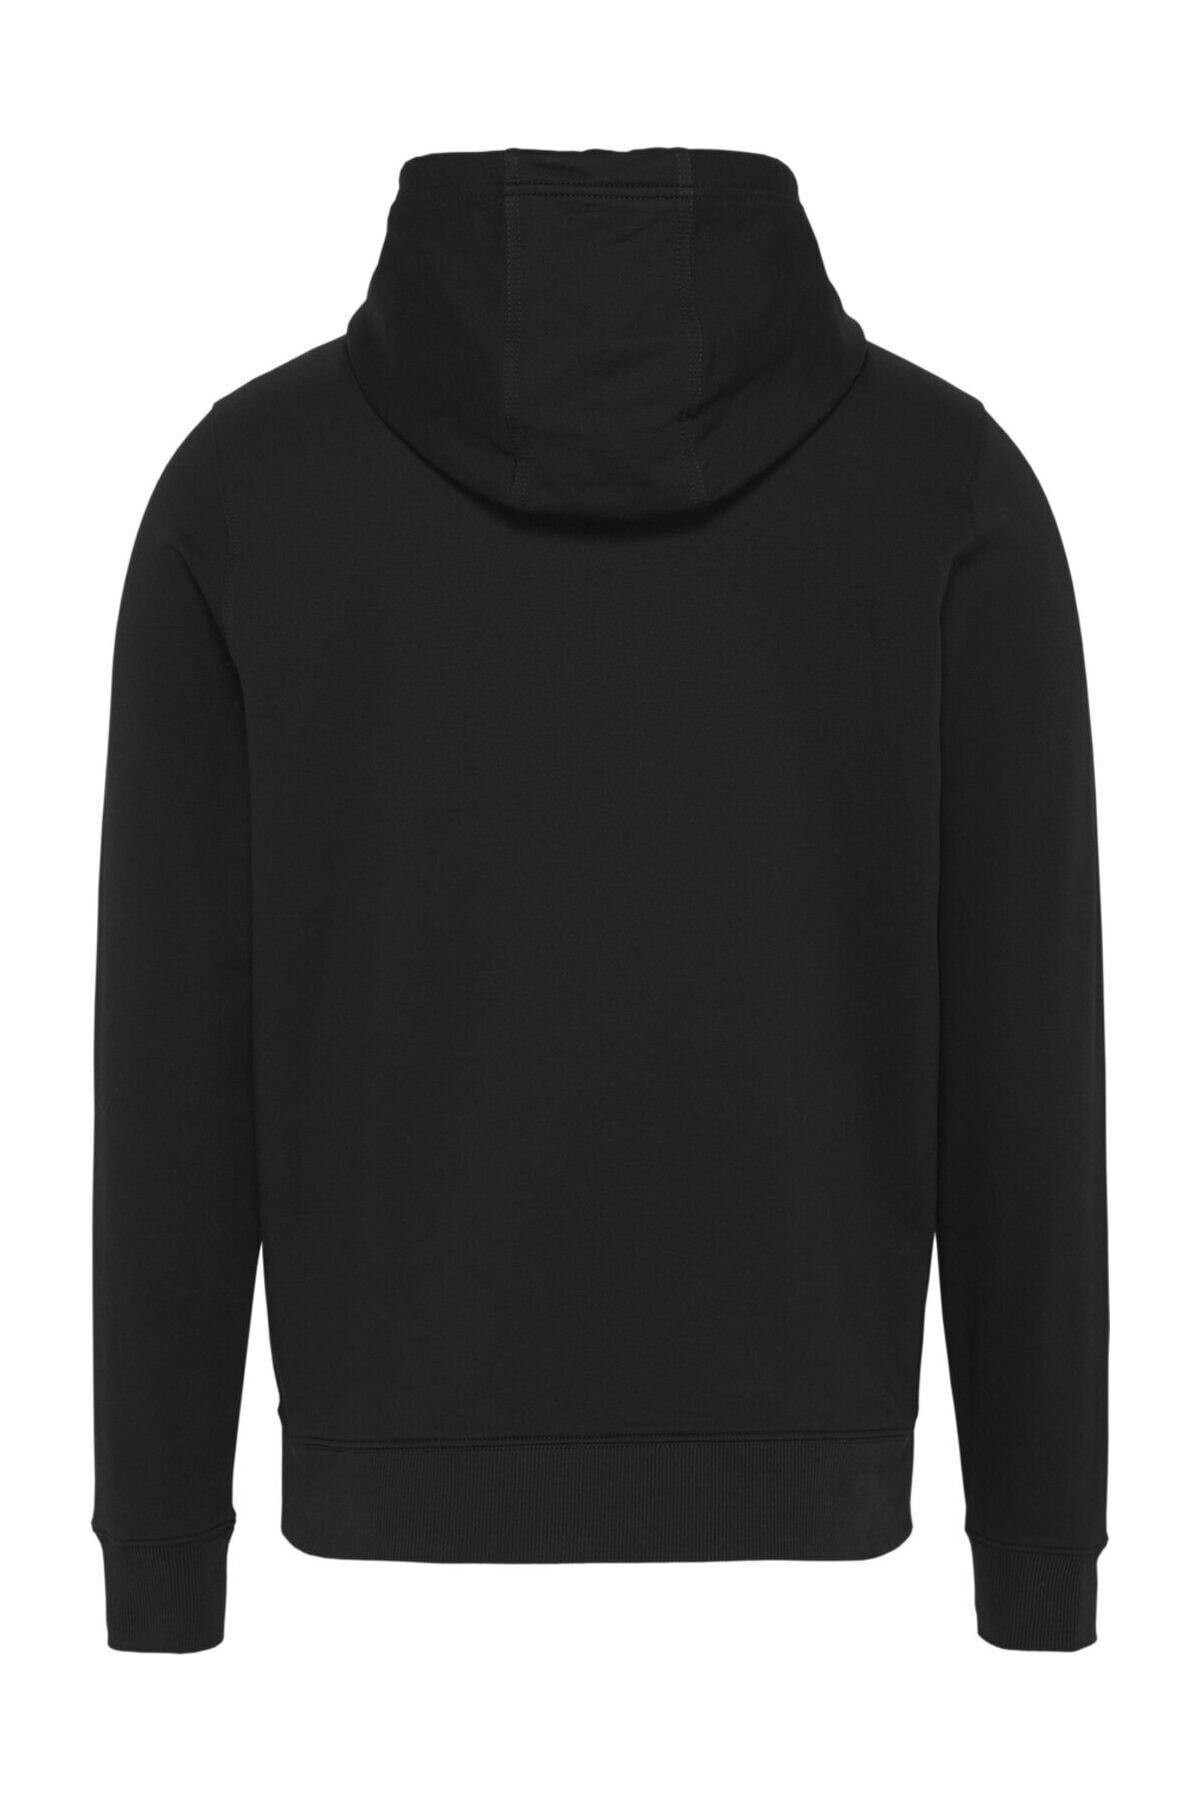 Tommy Hilfiger TH Erkek TJM Tommy Chest Graphic Sweatshirt DM0DM08730BDS 2